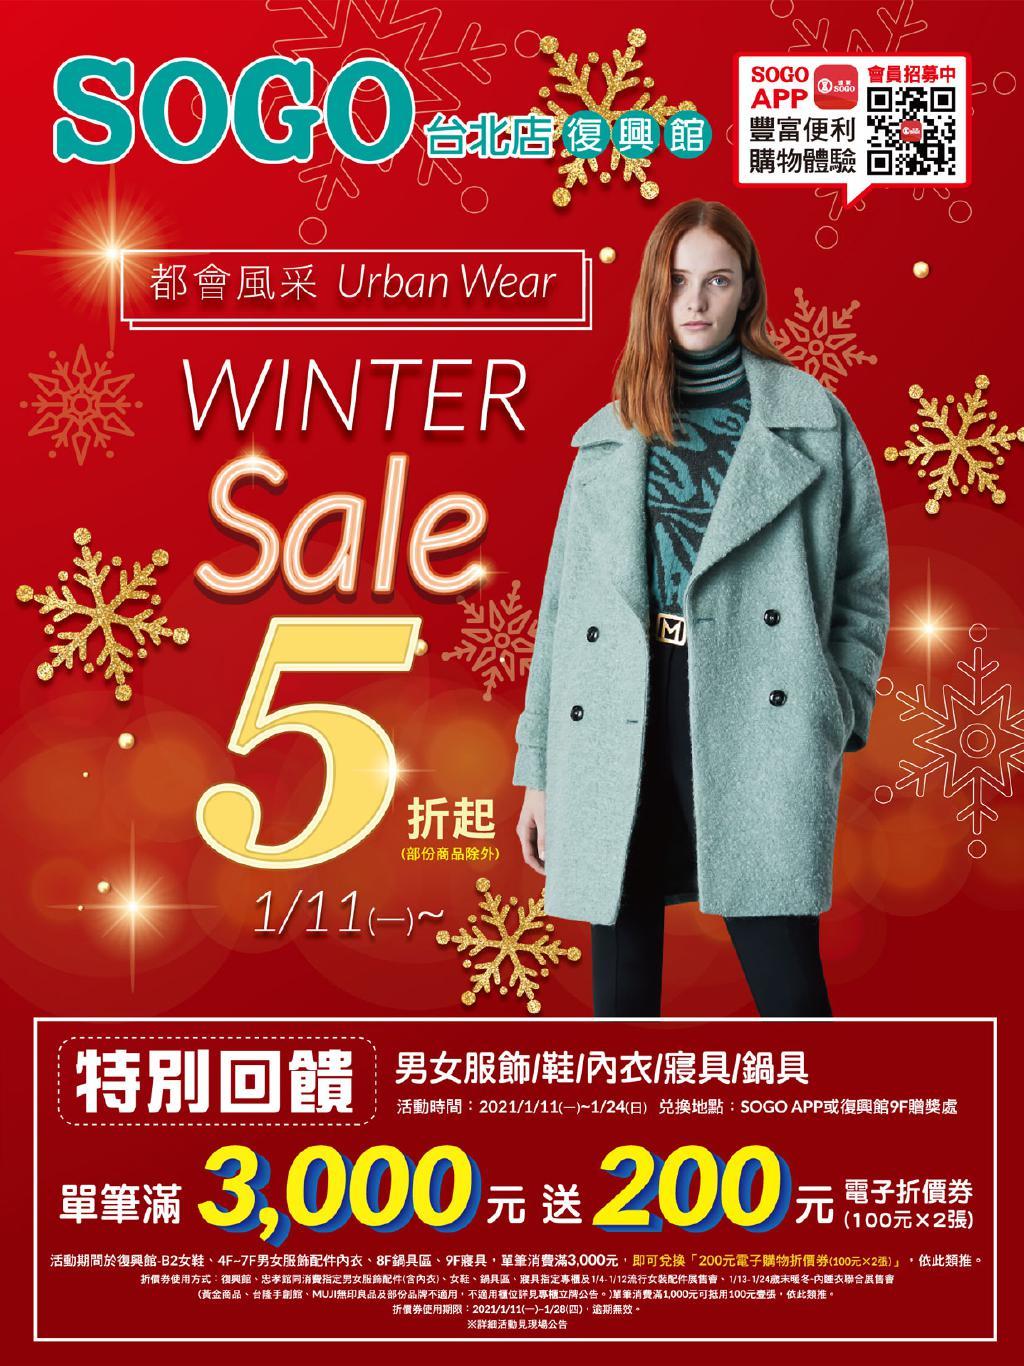 SOGO《台北復興館》DM 「Winter Sale 5折起~ 都會風采 Urban Wear」 【2021/2/28 止】